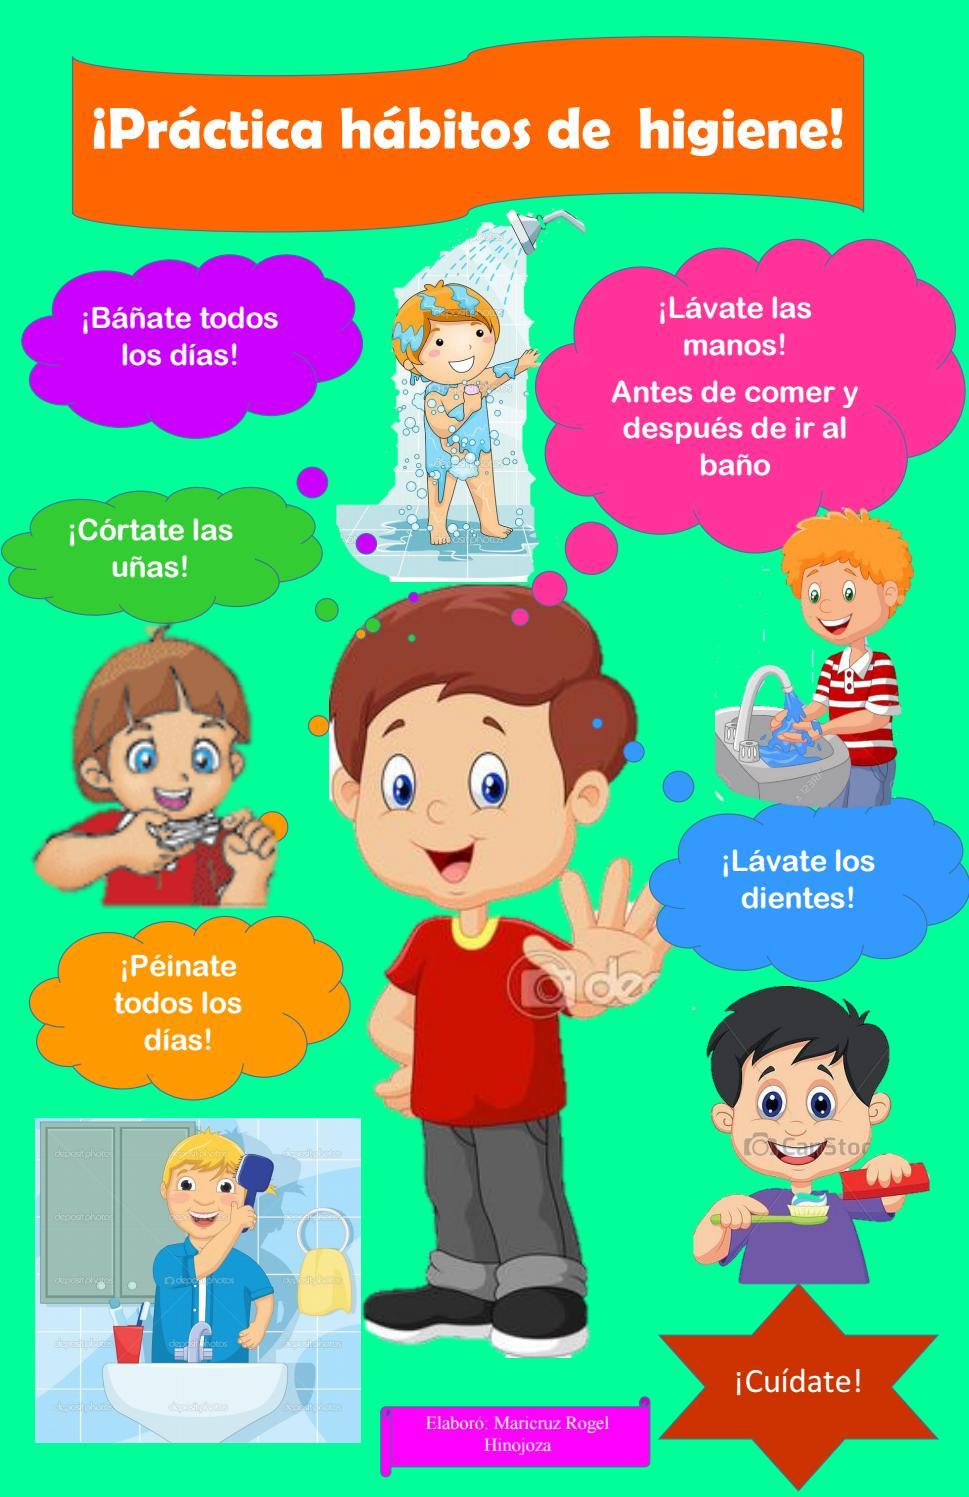 Cartel h bitos de higiene by maricruz issuu - Trucos para ir al bano todos los dias ...